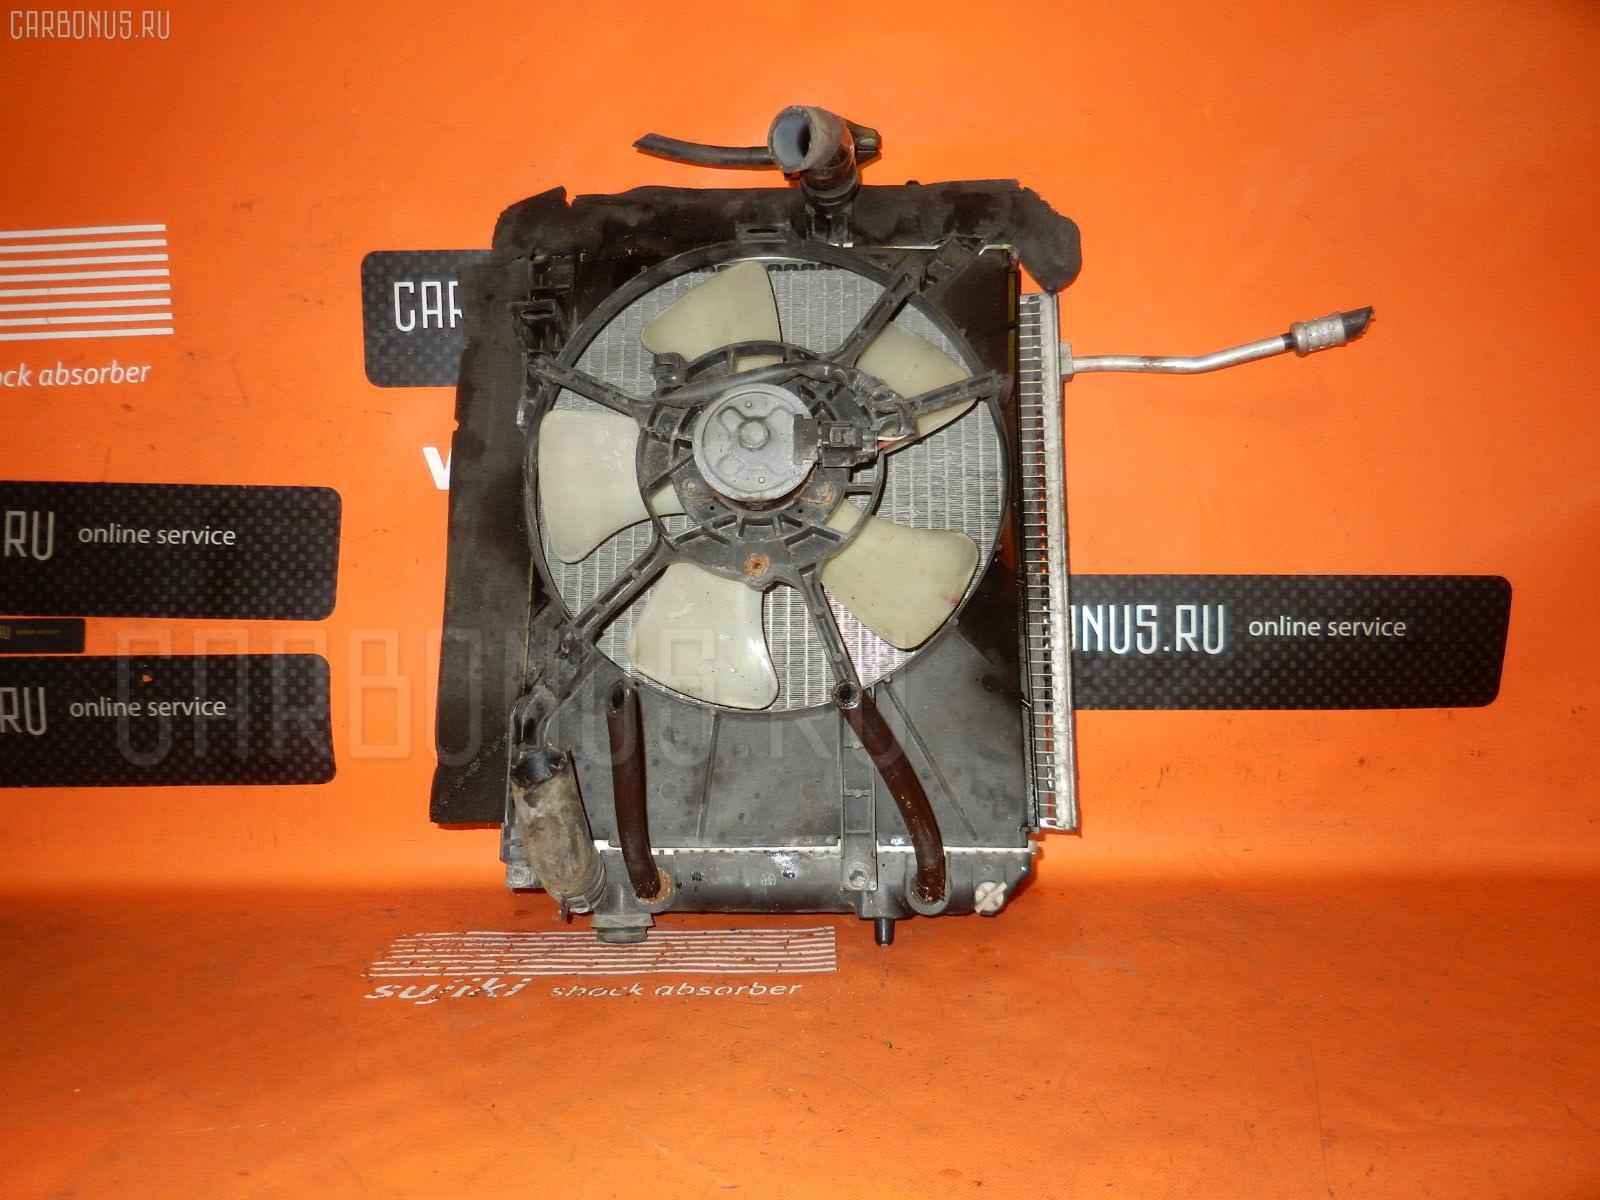 Радиатор ДВС DAIHATSU BOON M300S 1KR-FE. Фото 5